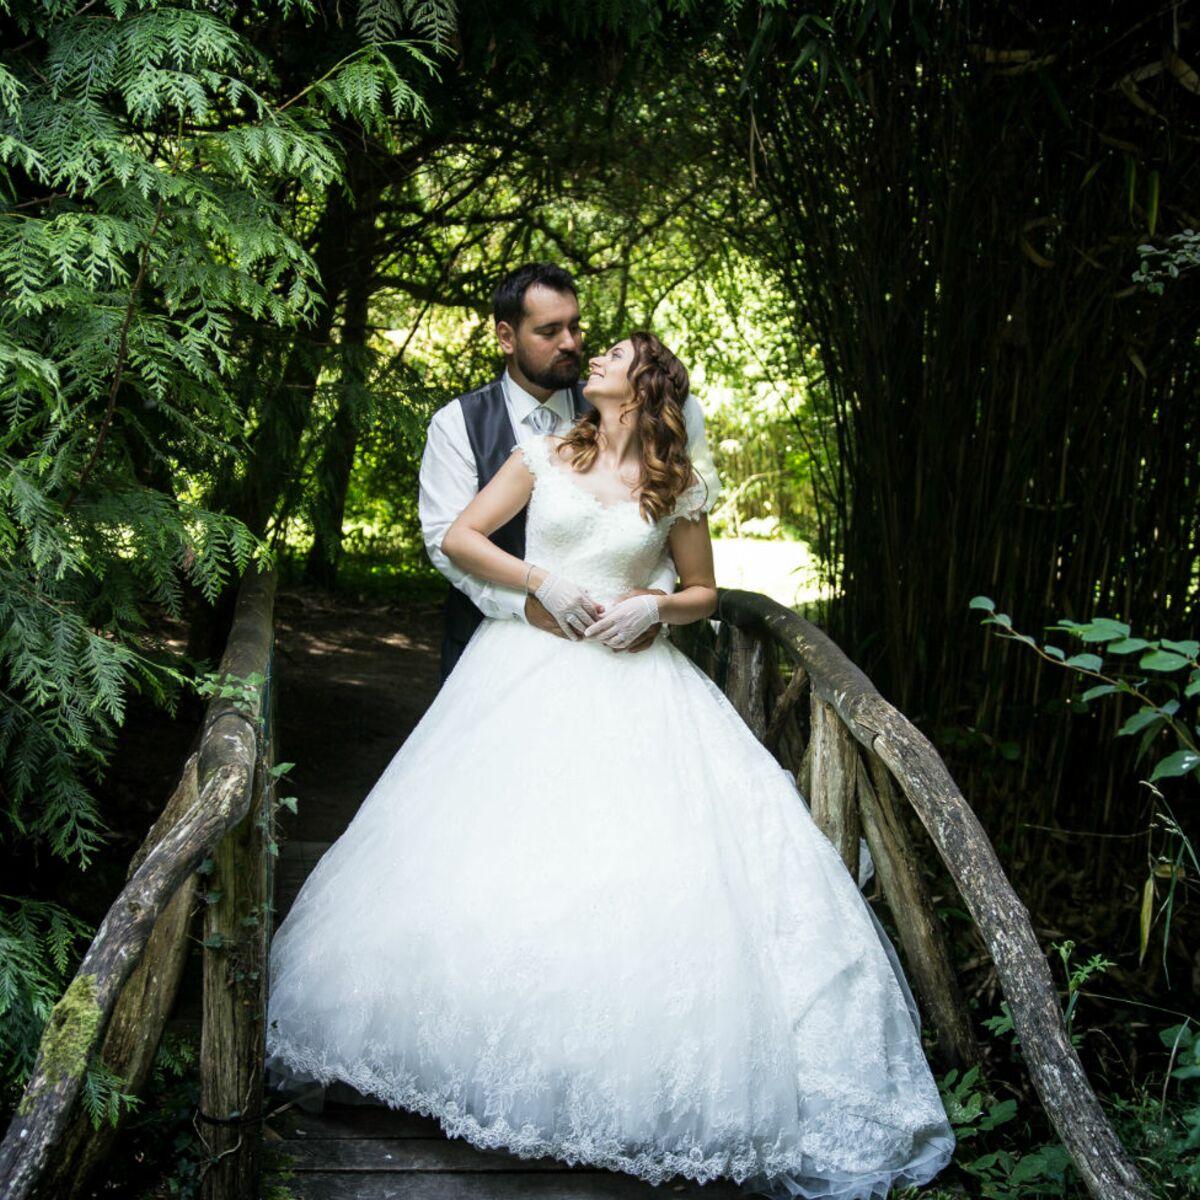 Histoire de mariage : le joli jour fleuri